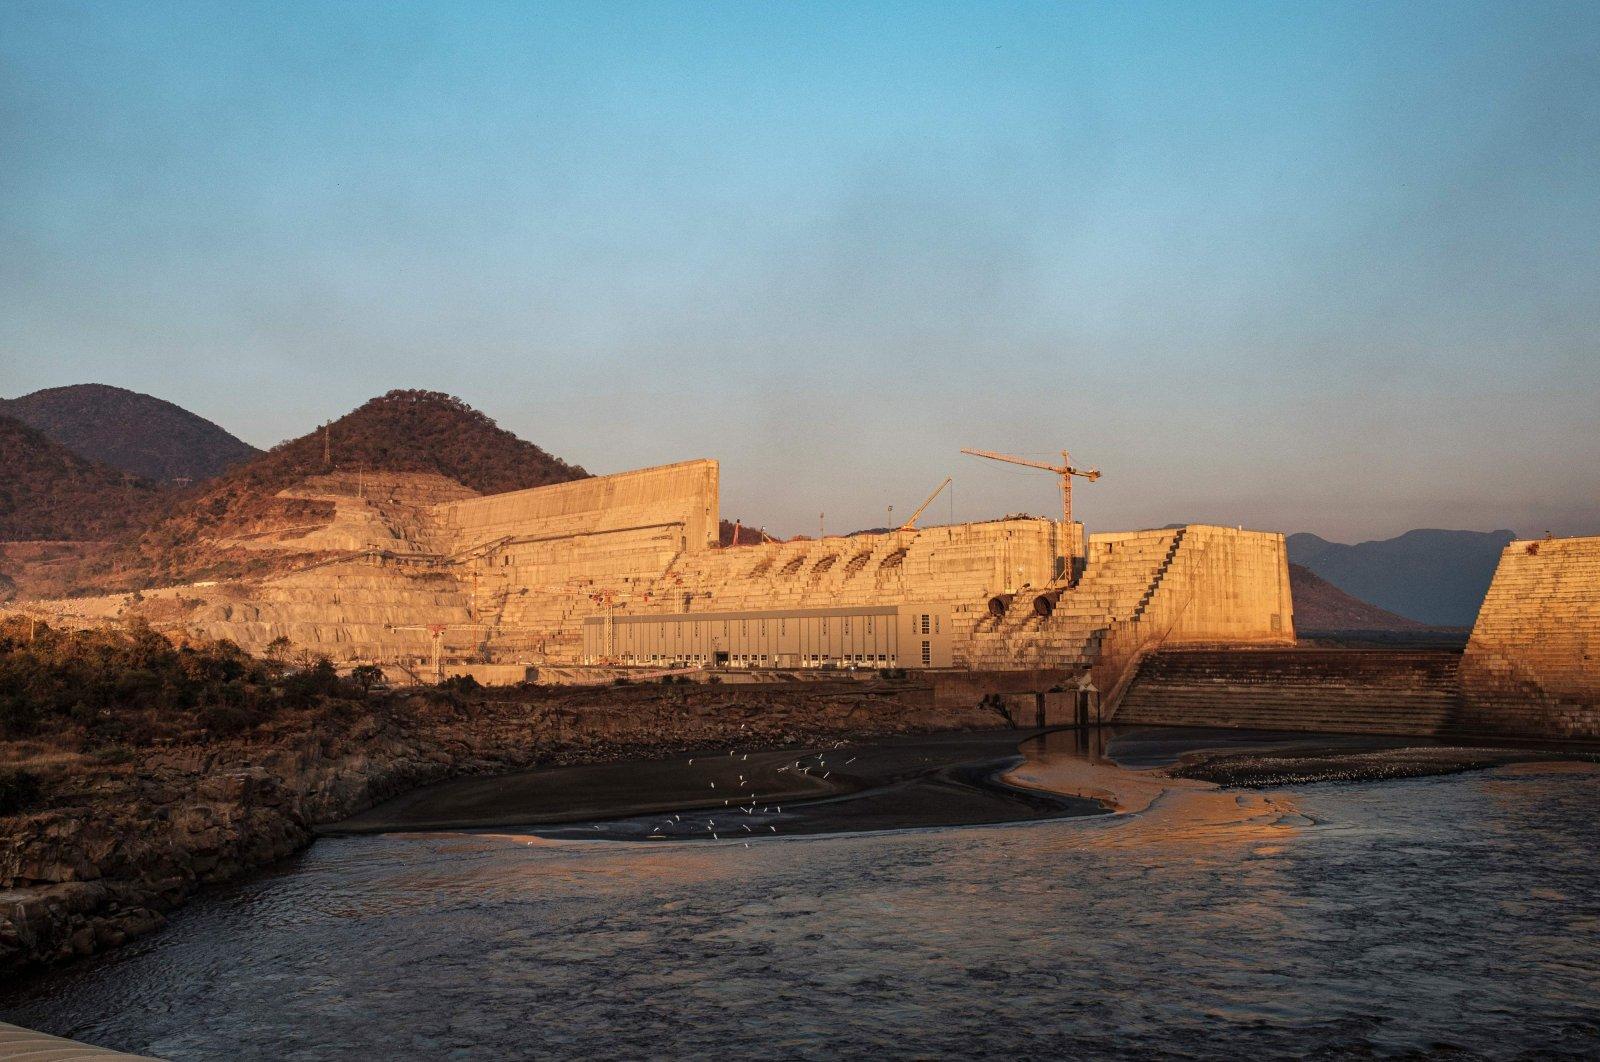 This file photo taken shows a general view of the Grand Ethiopian Renaissance Dam (GERD) under construction, near Guba in Ethiopia, Dec. 26, 2019, (AFP Photo)